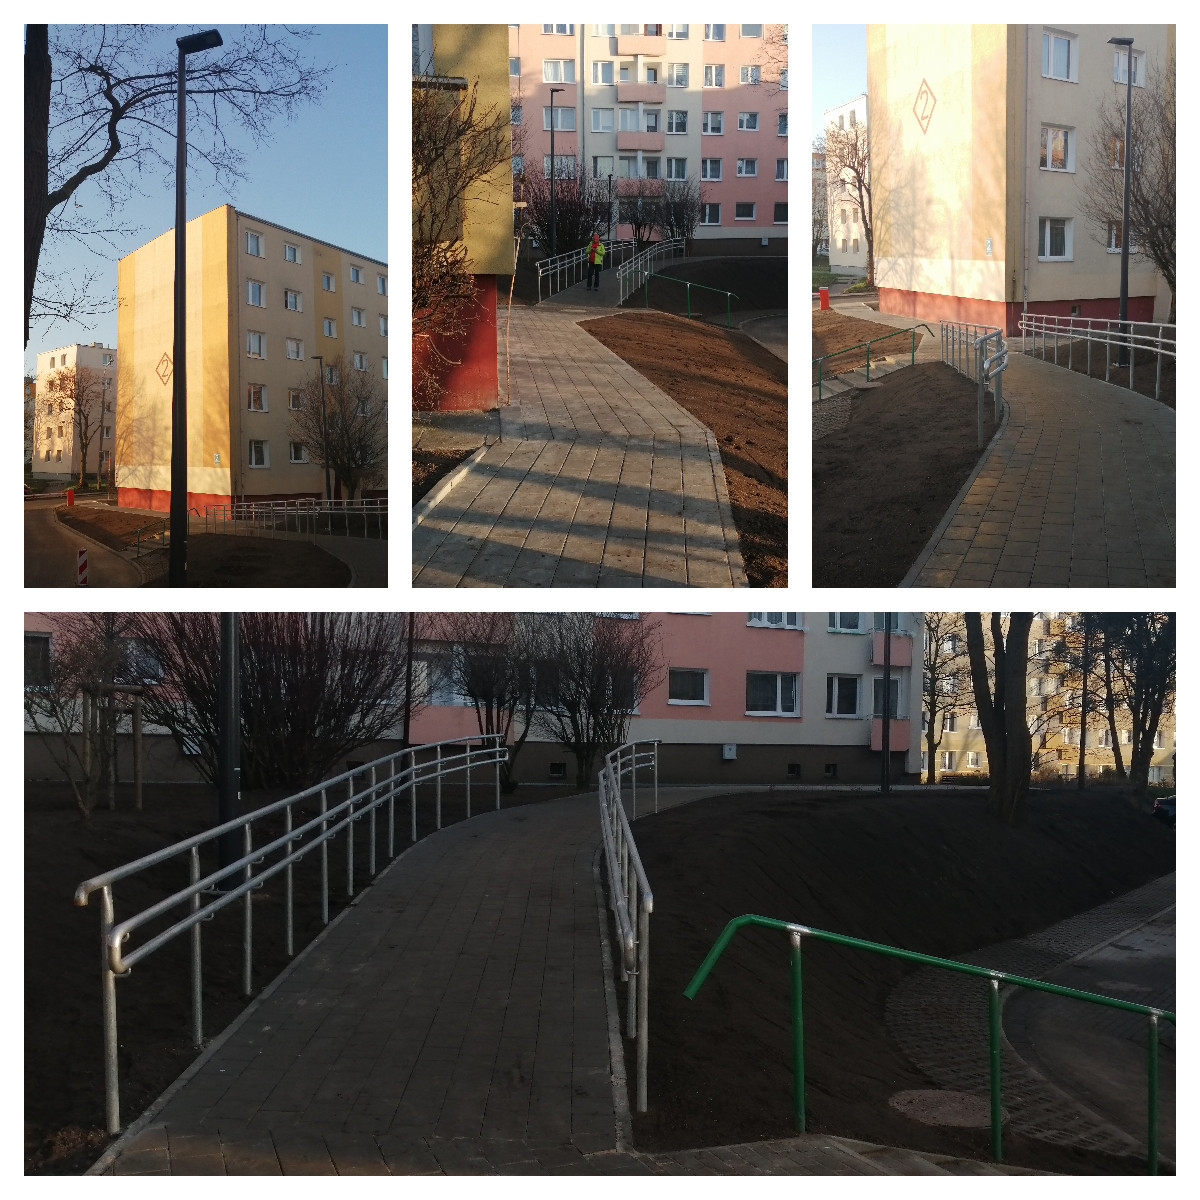 Ścieżka po remoncie/ fot. ZDiZ